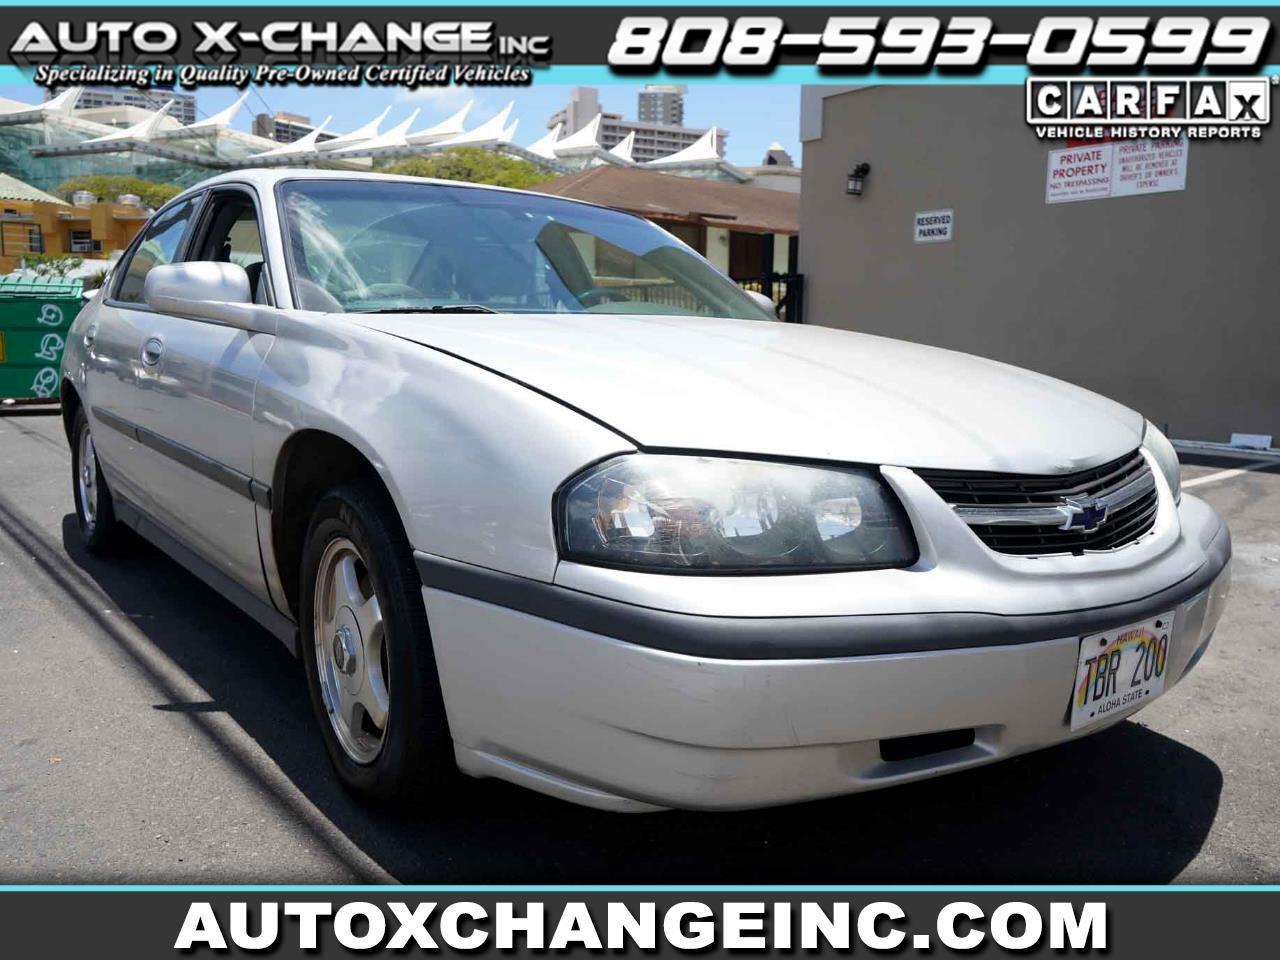 Chevrolet Impala 4dr Sdn 2004